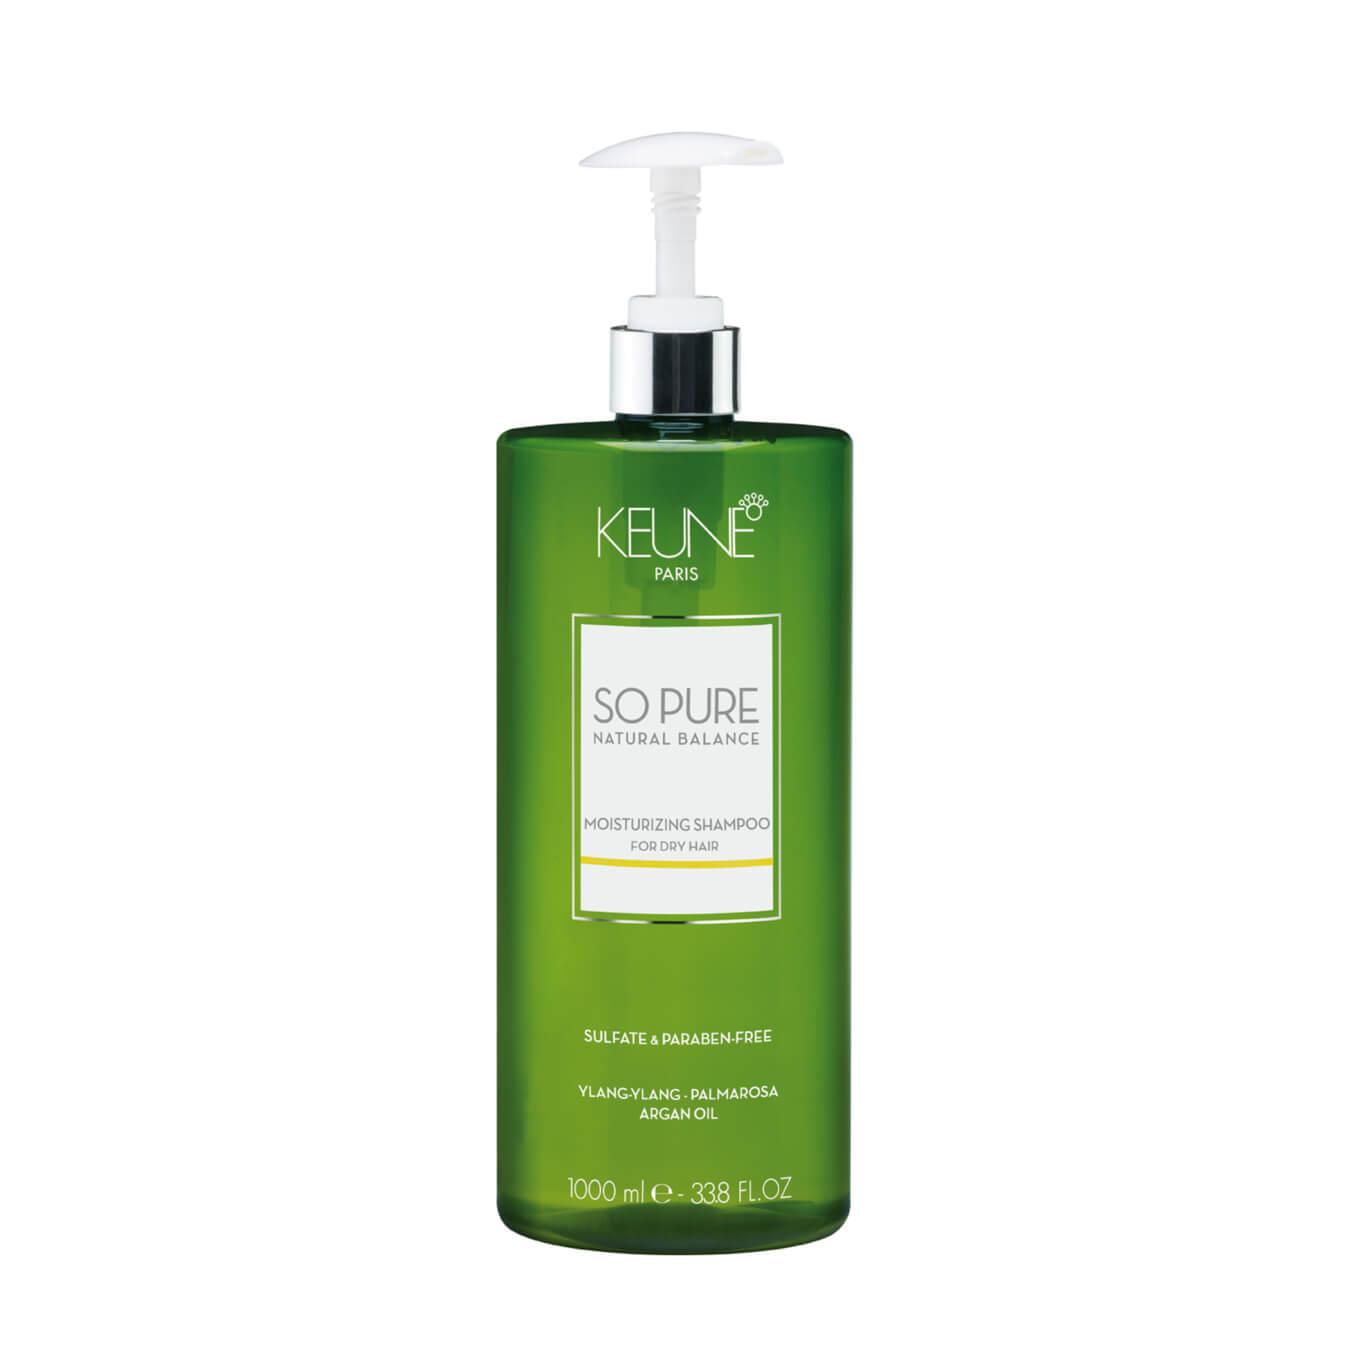 keune so pure moisturizing shampoo 1000ml 8718375521779